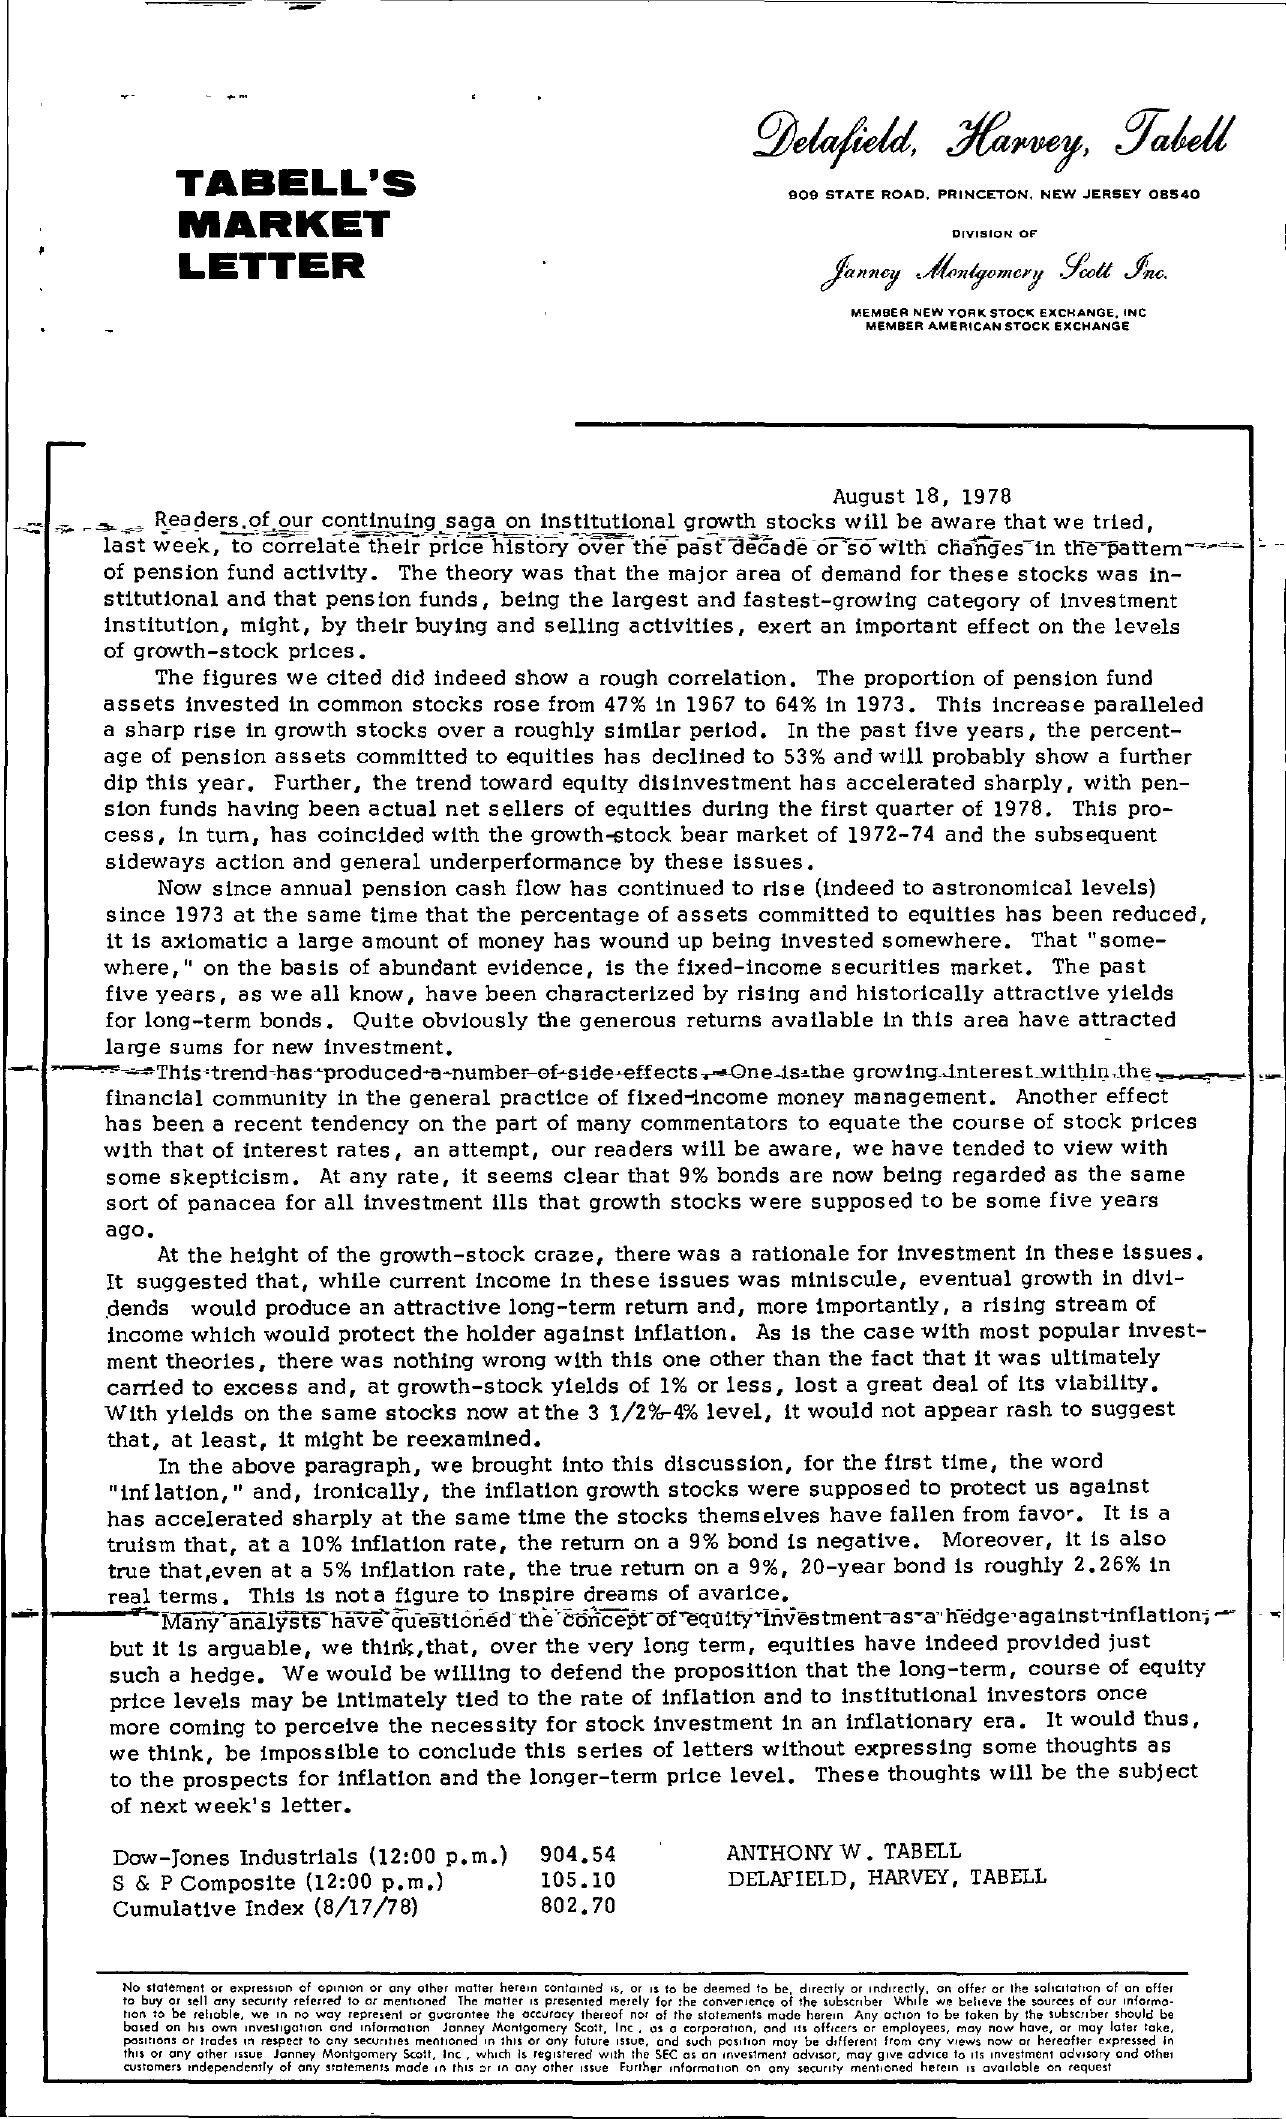 Tabell's Market Letter - August 18, 1978